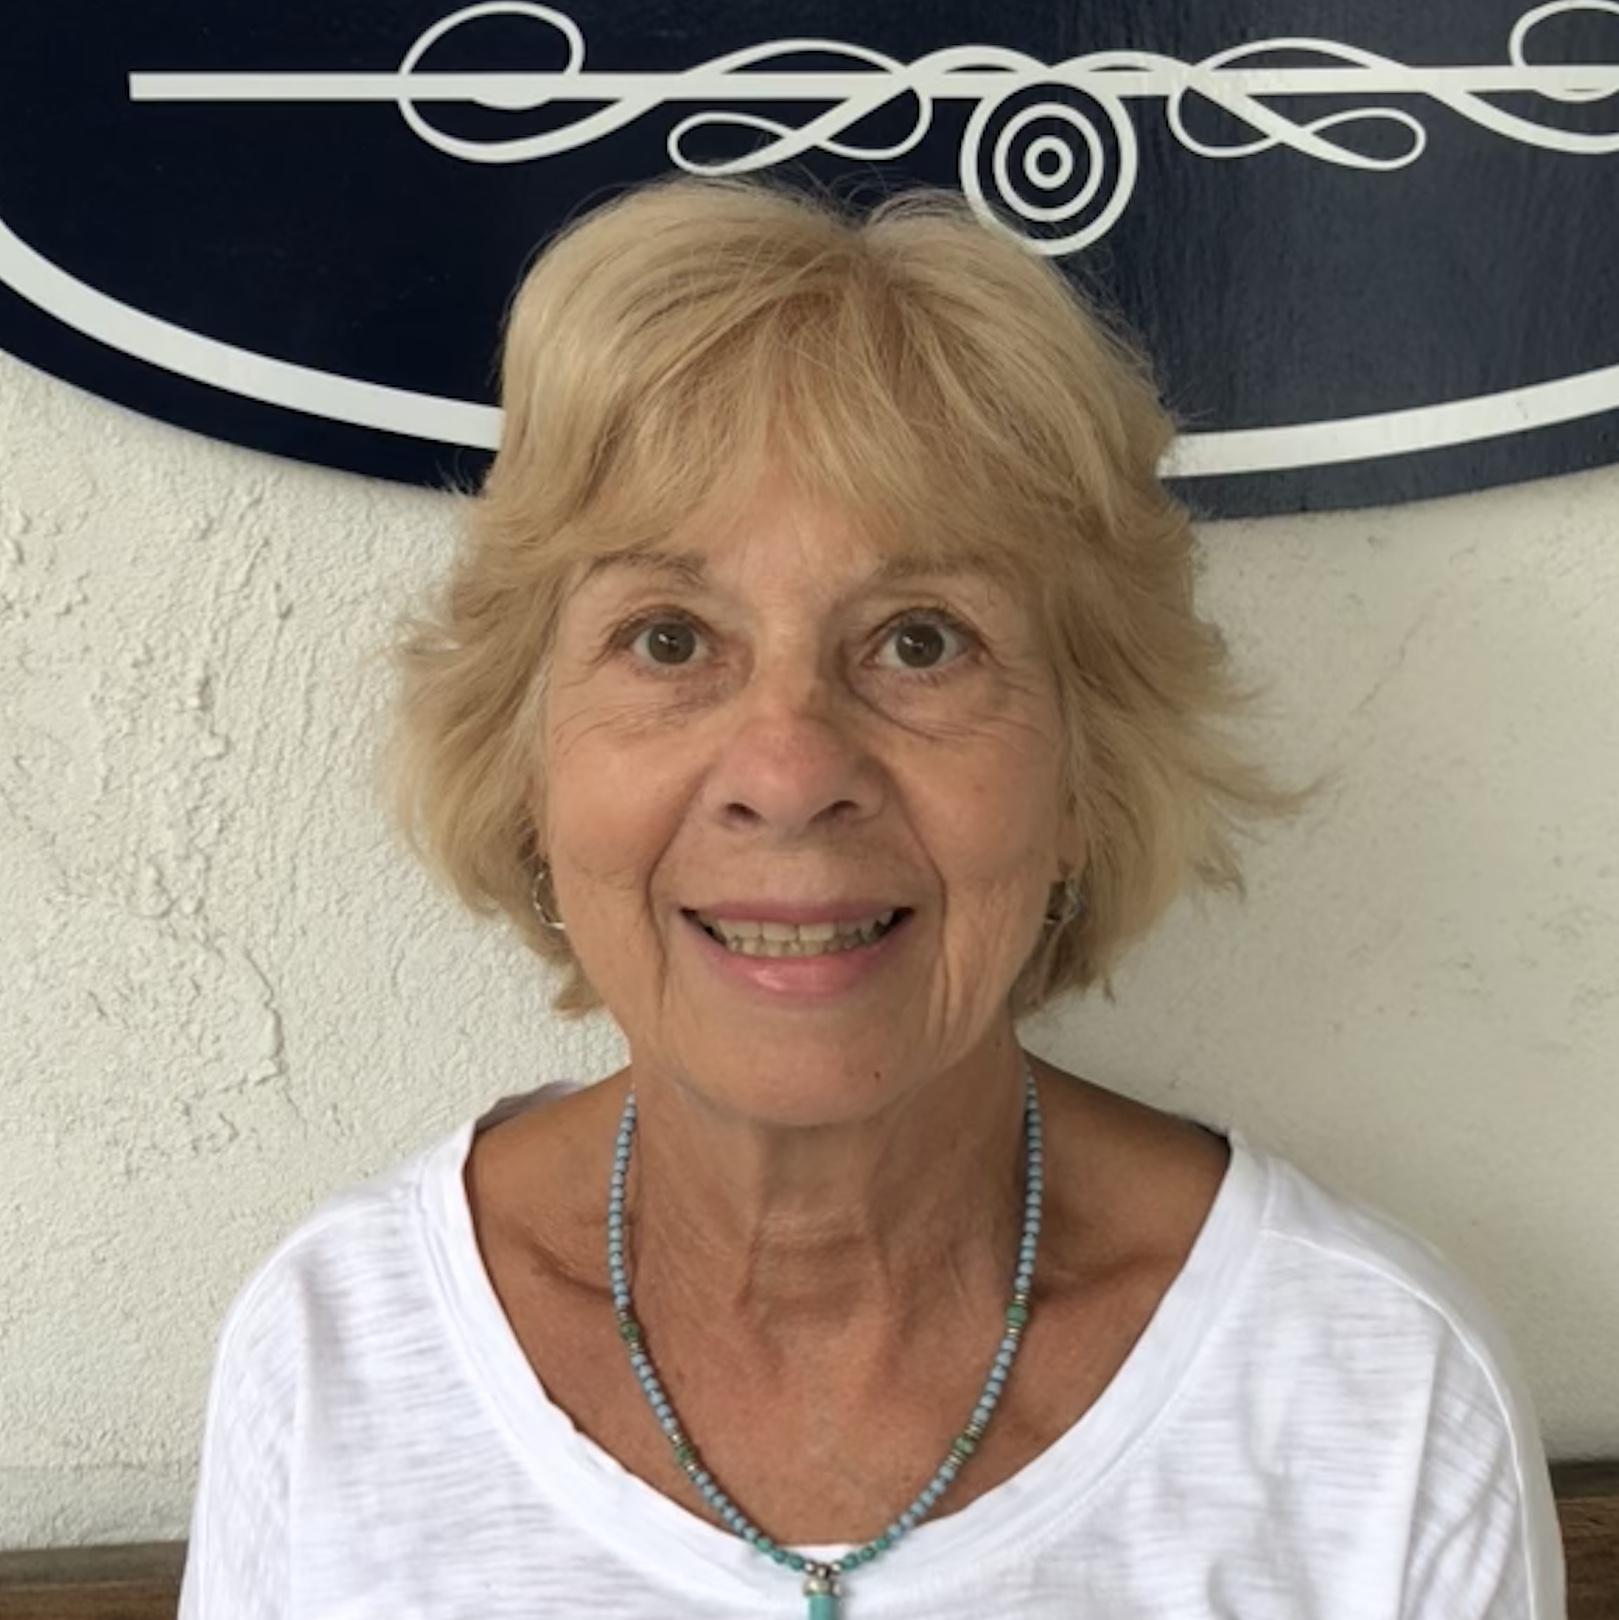 Rosemary - Medical Receptionist / Scheduler